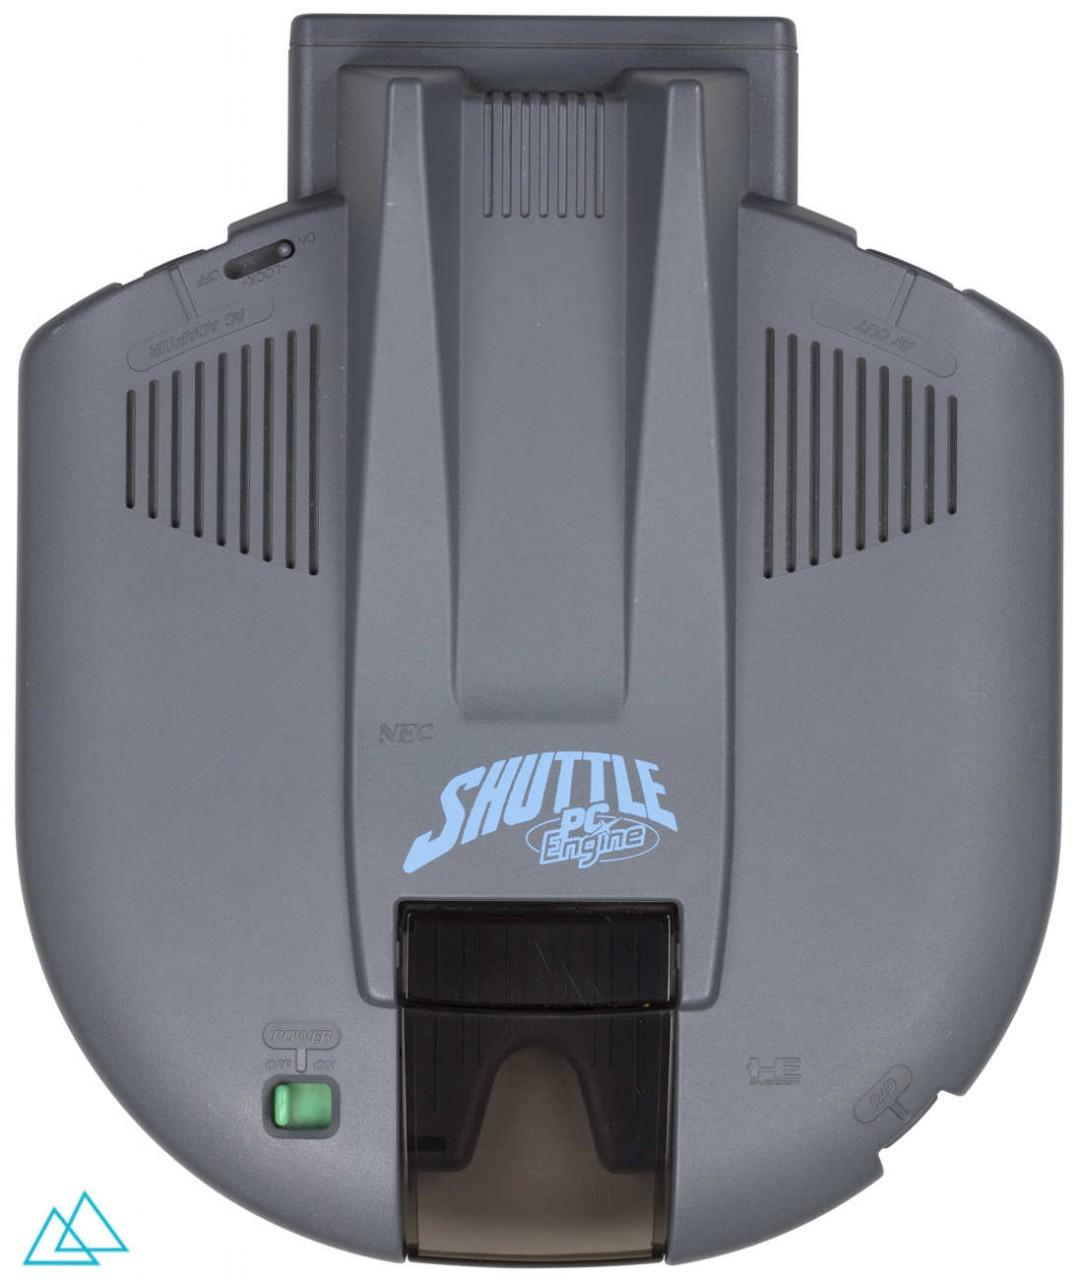 # 120 NEC PC Engine Shuttle